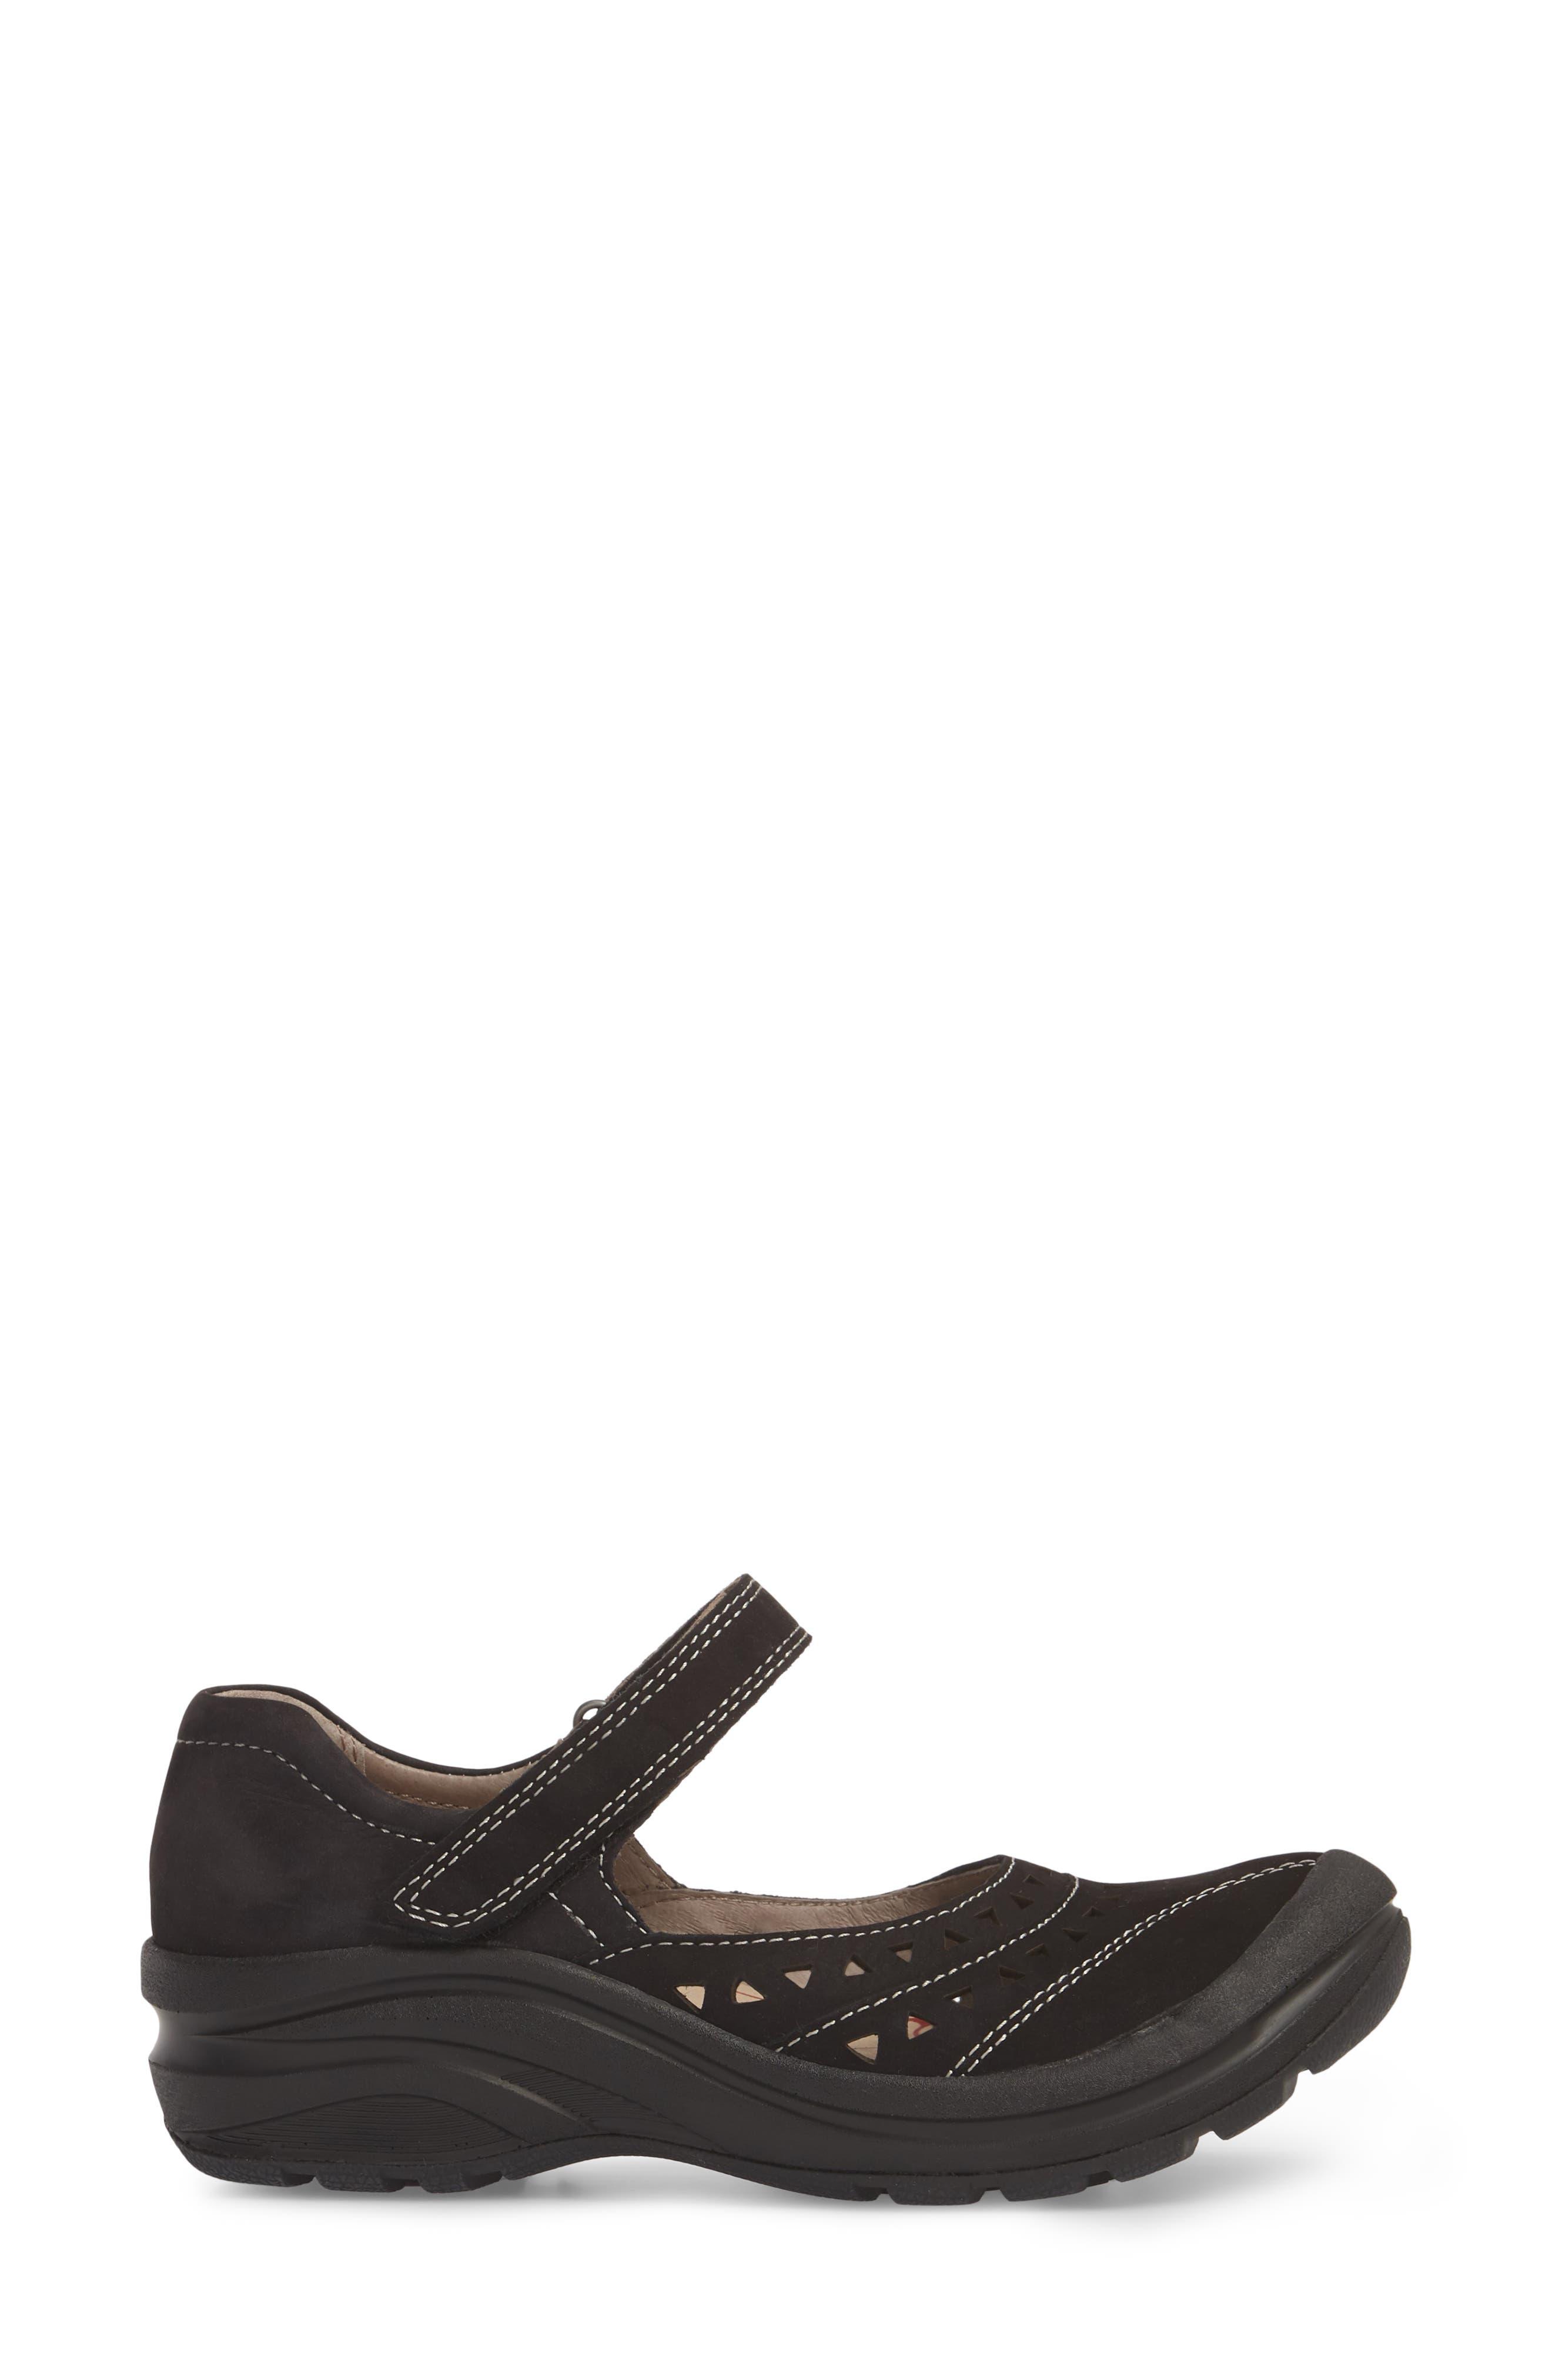 BIONICA,                             Matia Mary Jane Sneaker,                             Alternate thumbnail 3, color,                             BLACK LEATHER